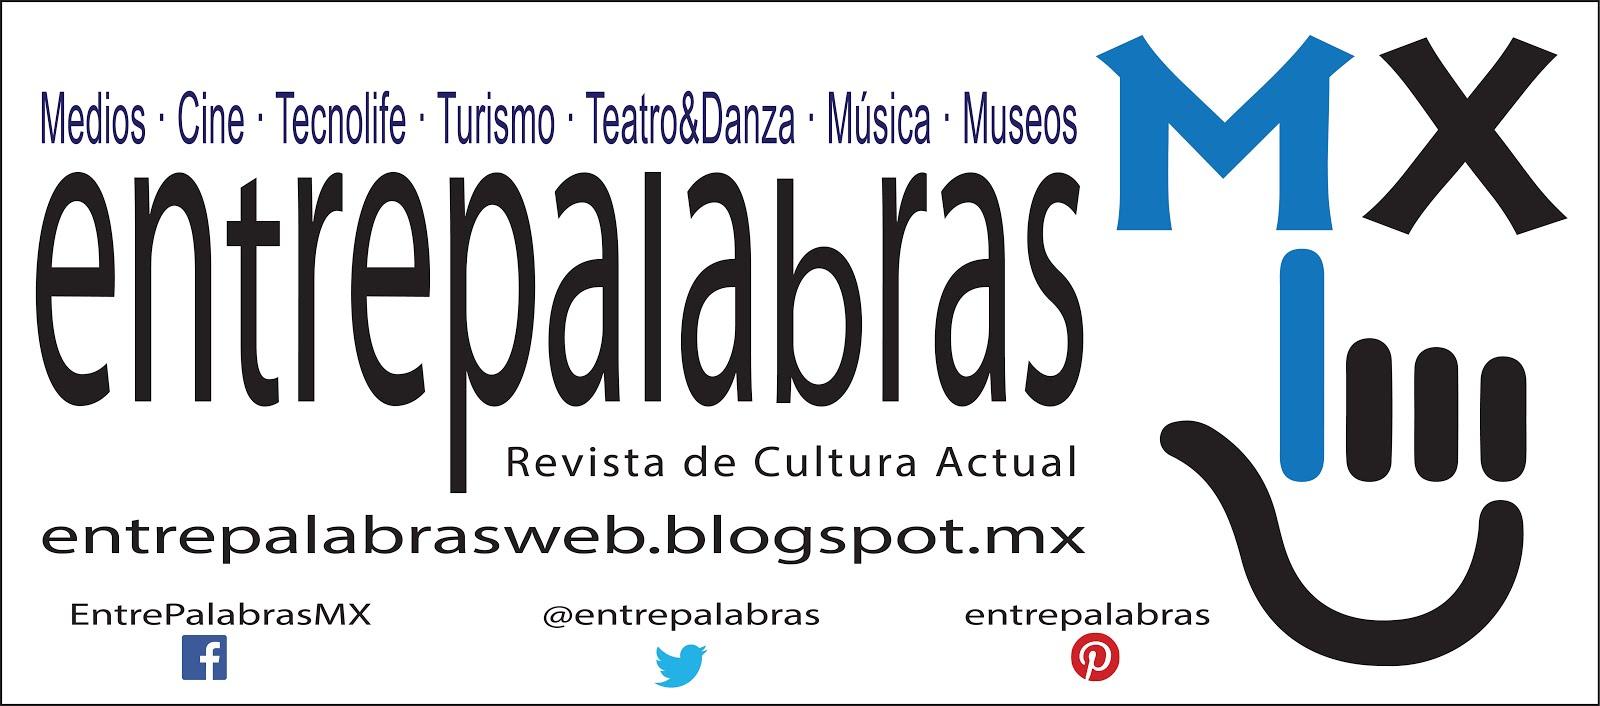 entrepalabrasweb